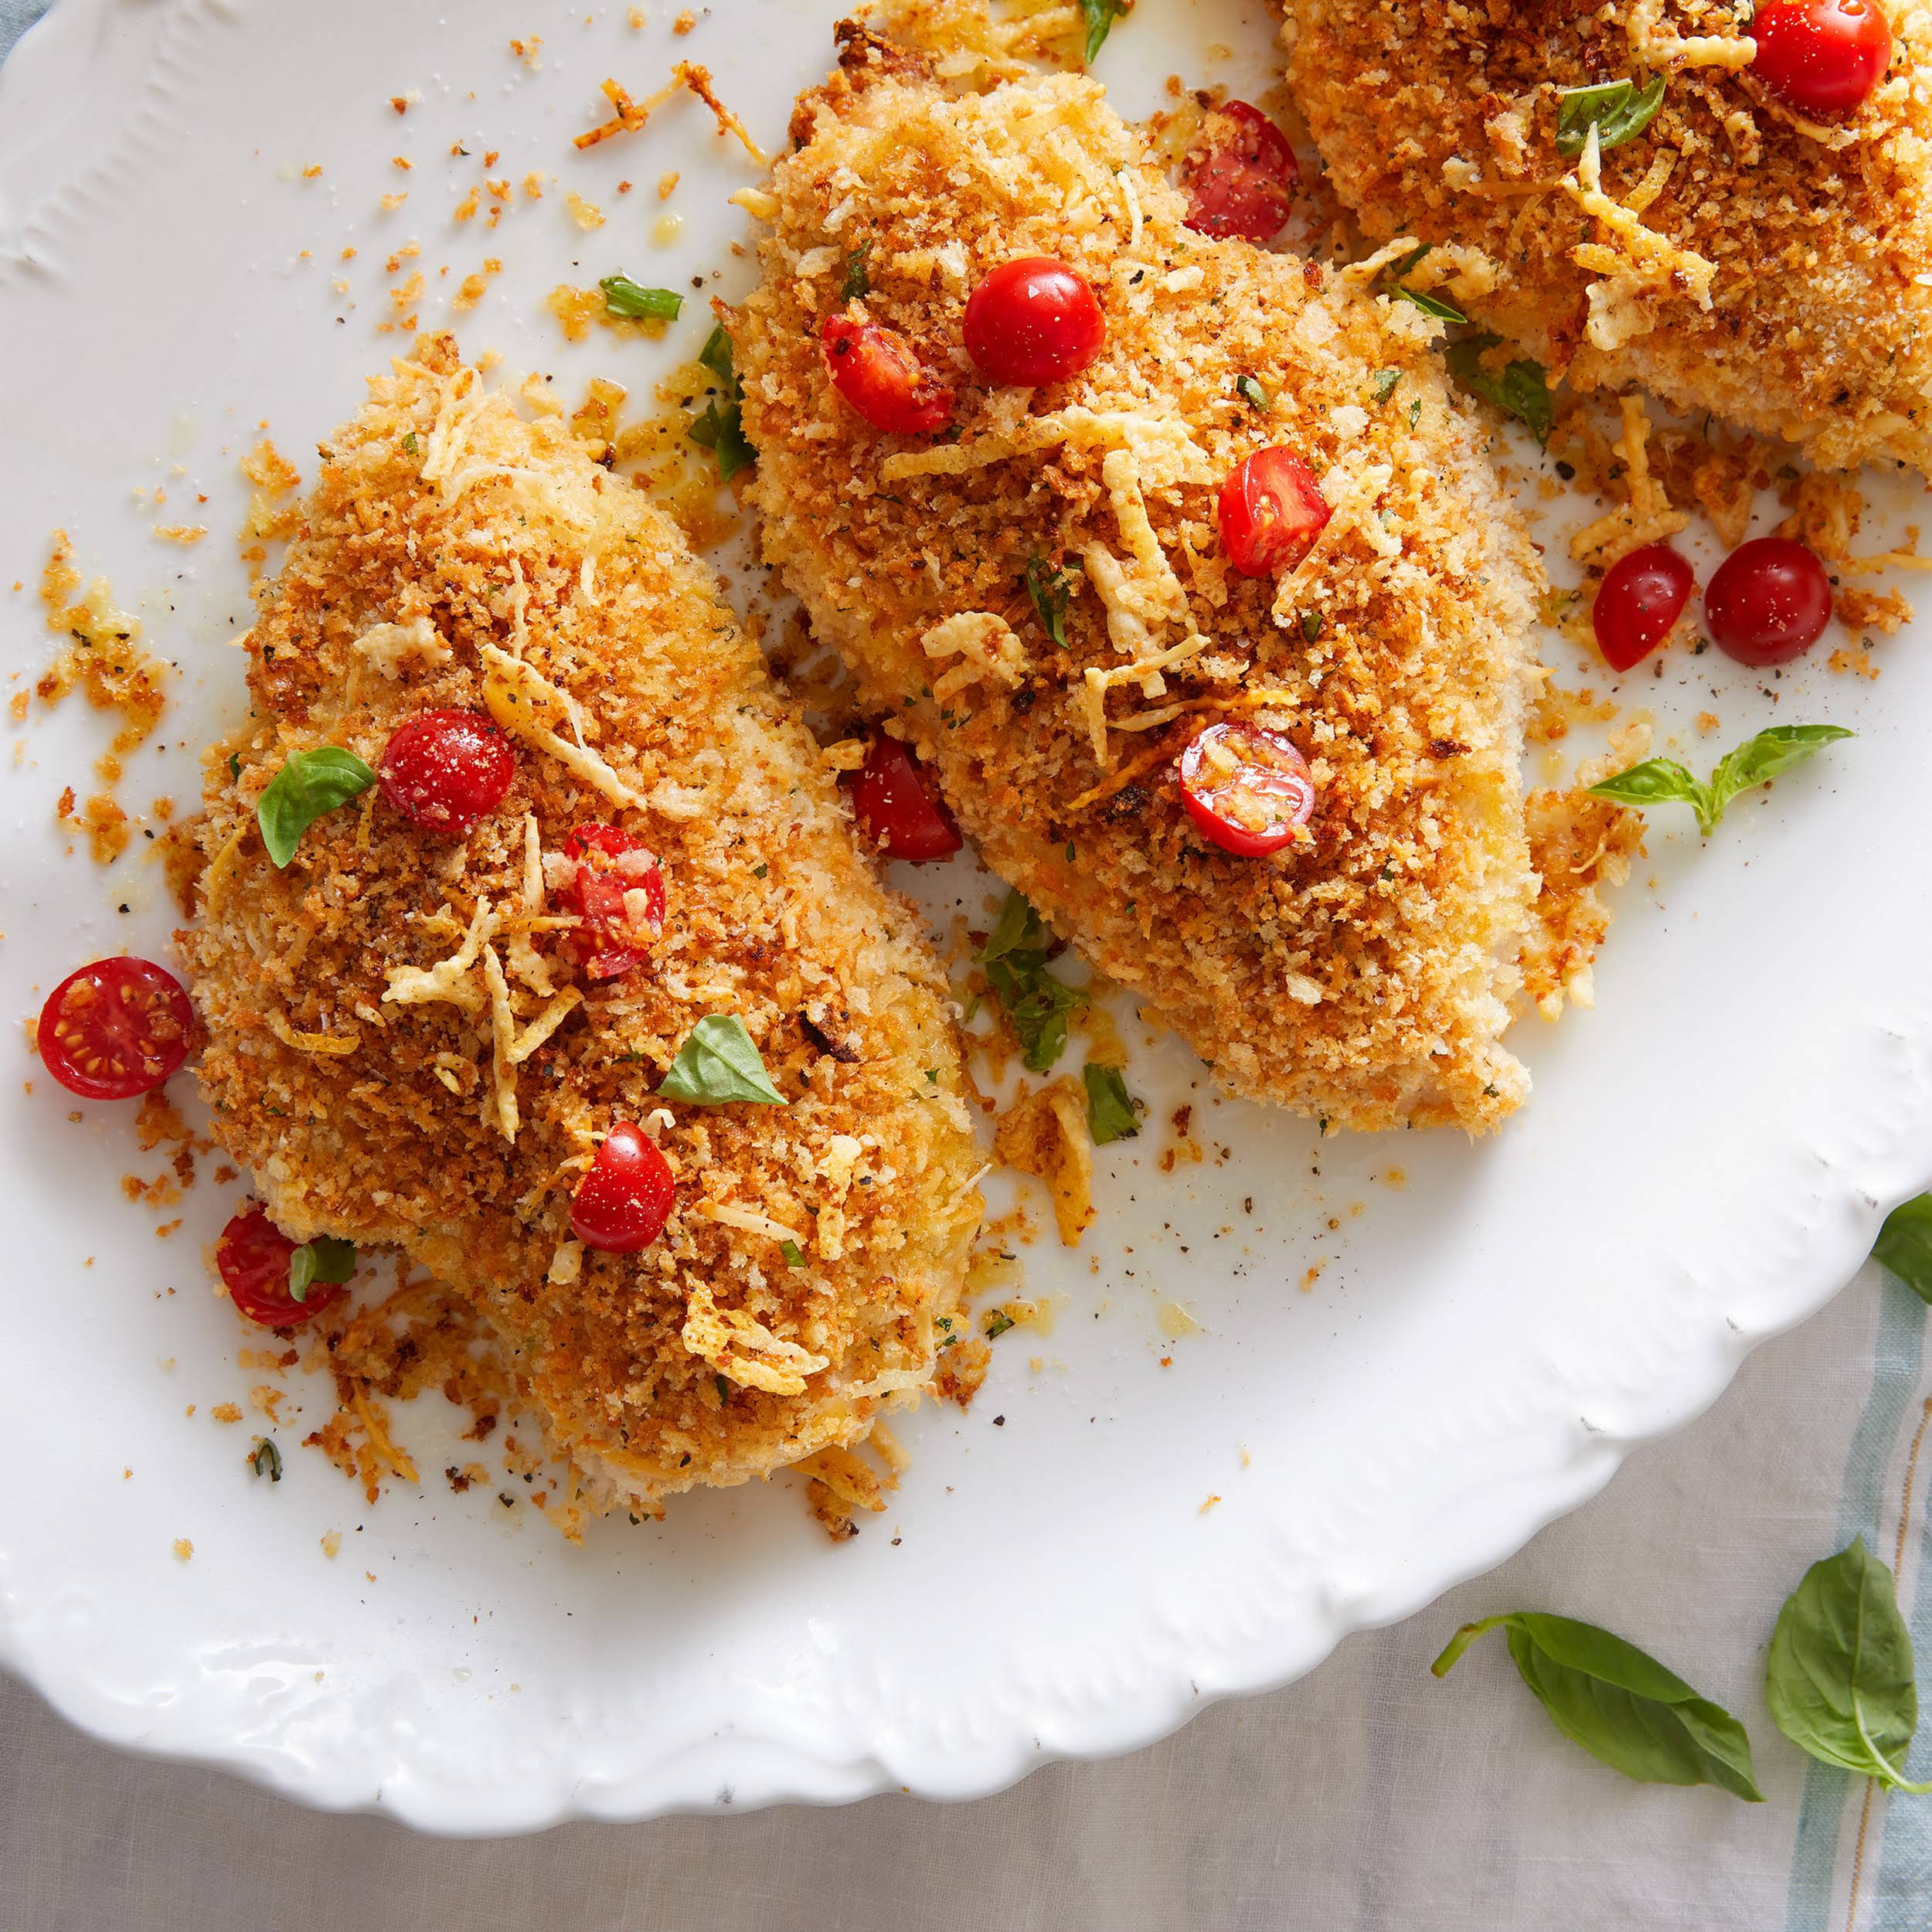 Crispy Panko-Parmesan Chicken Breasts